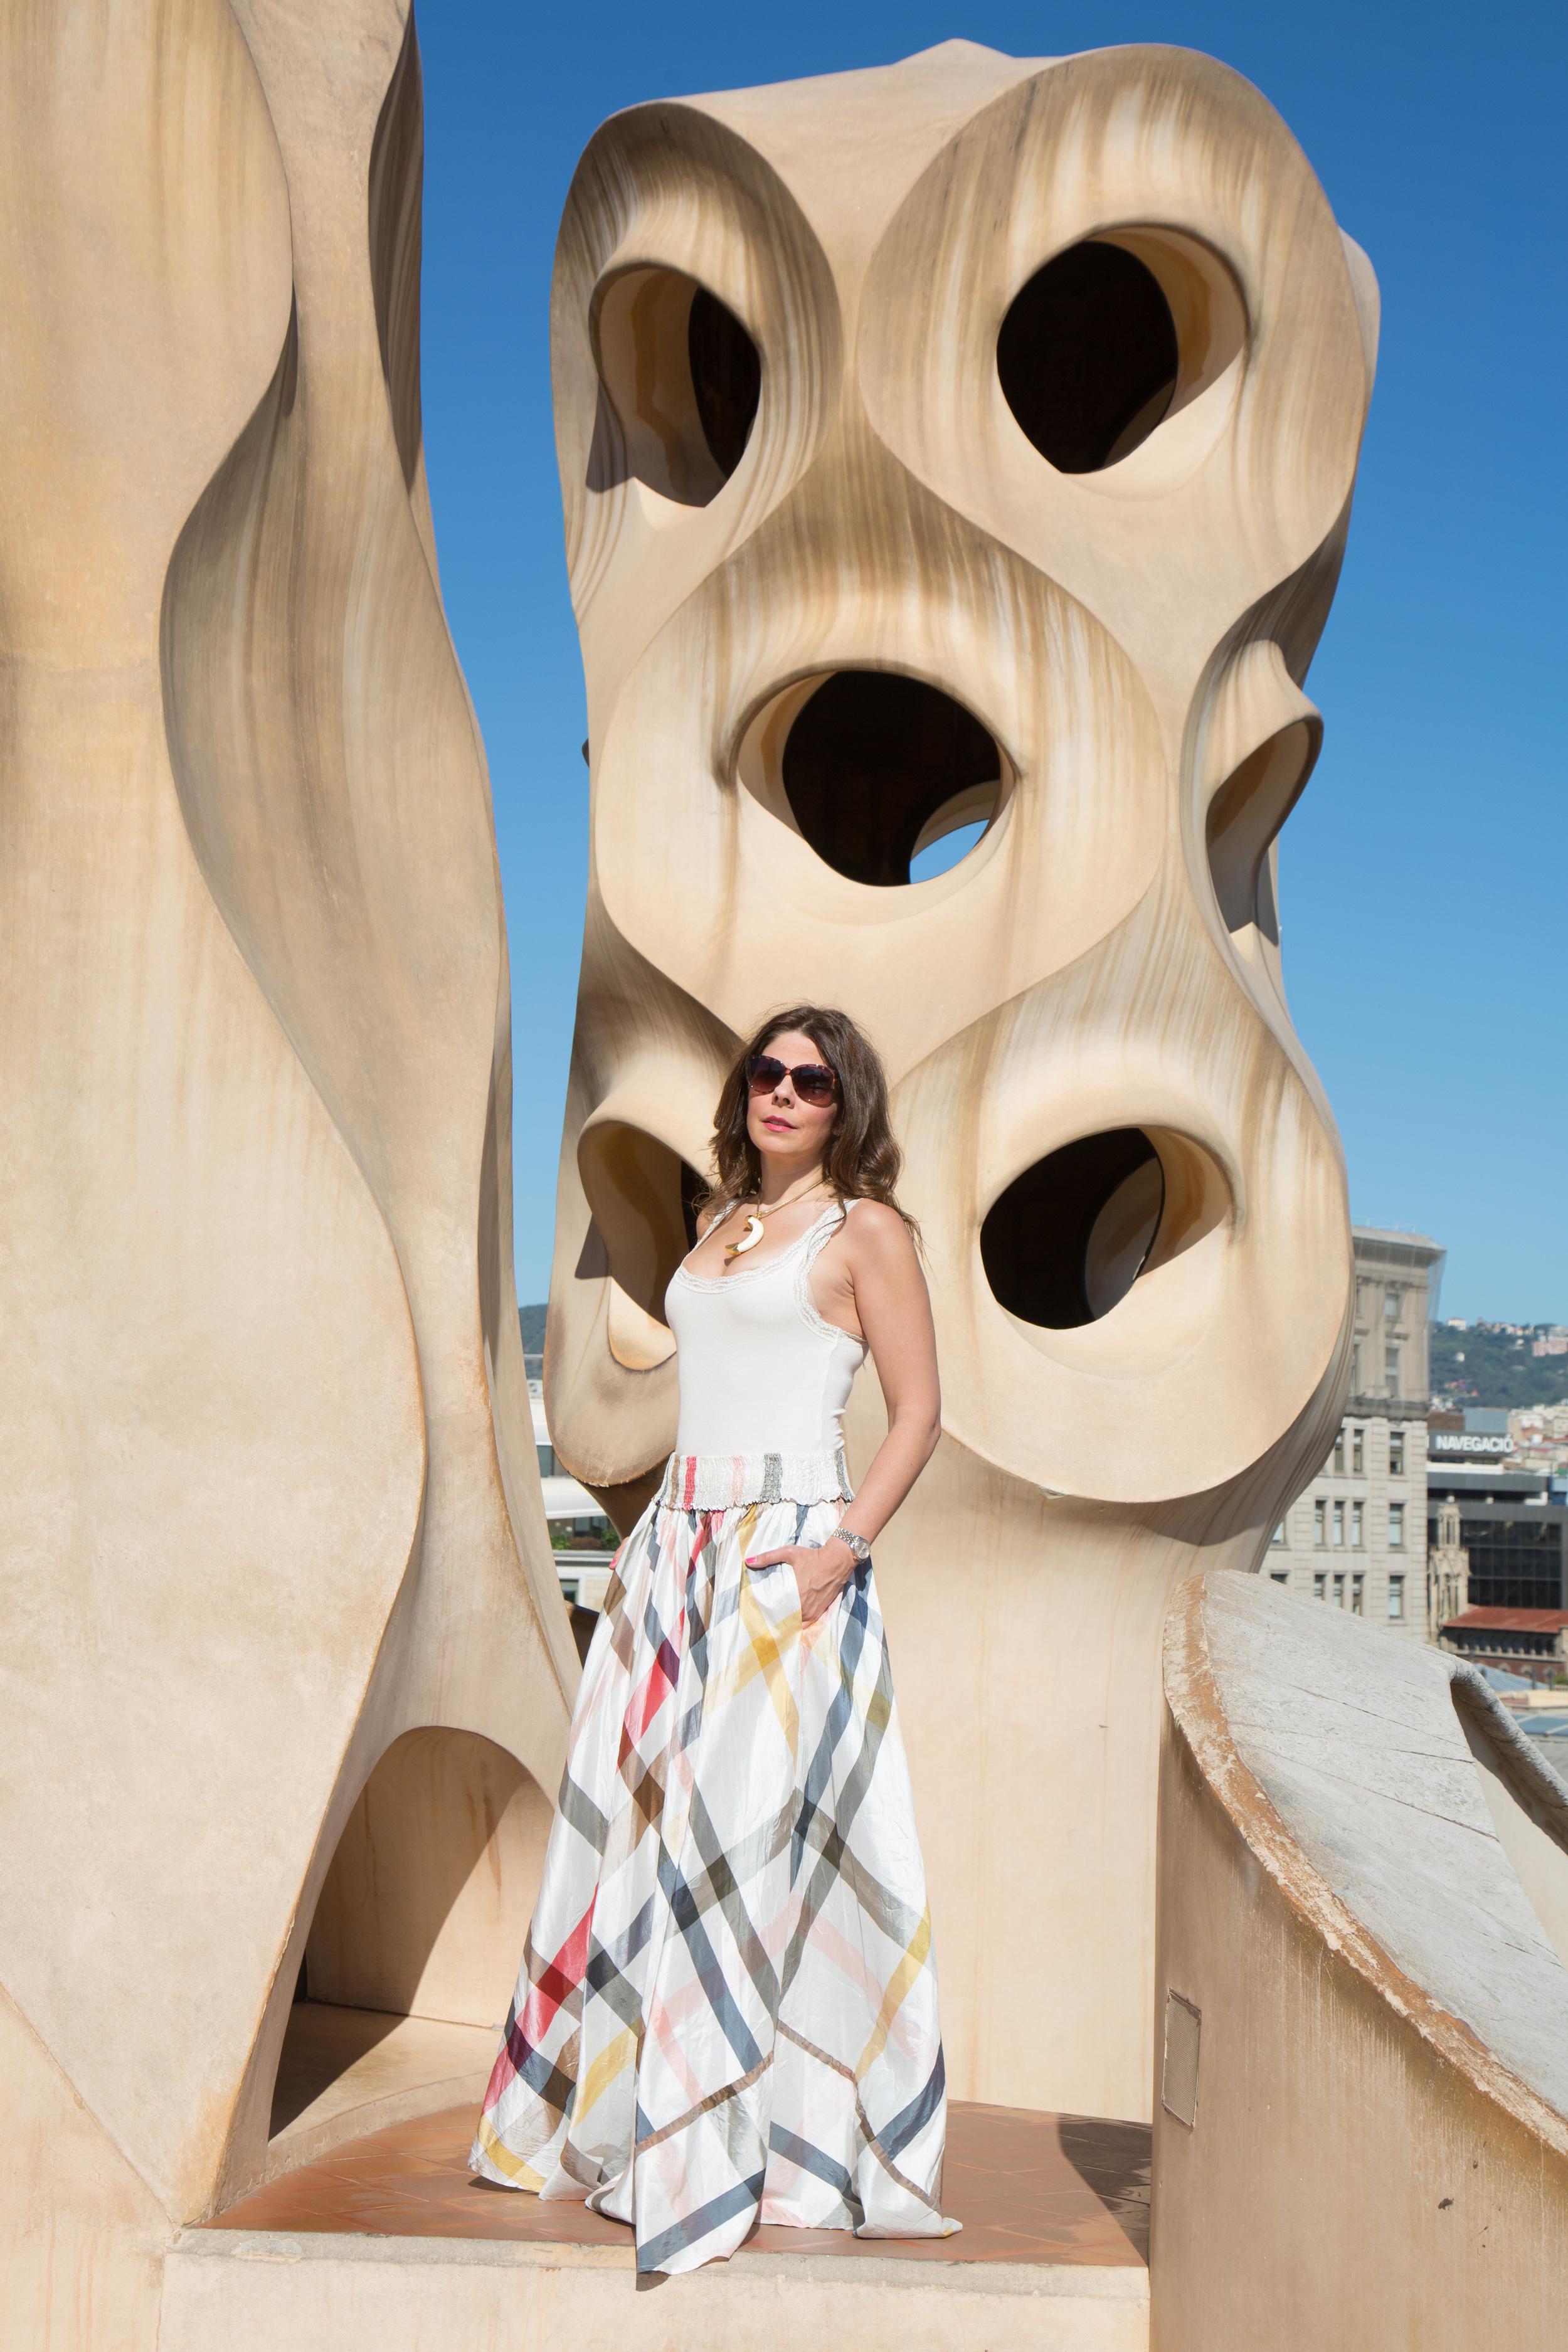 Maria-Brito_Barcelona-Gaudi-24.jpg